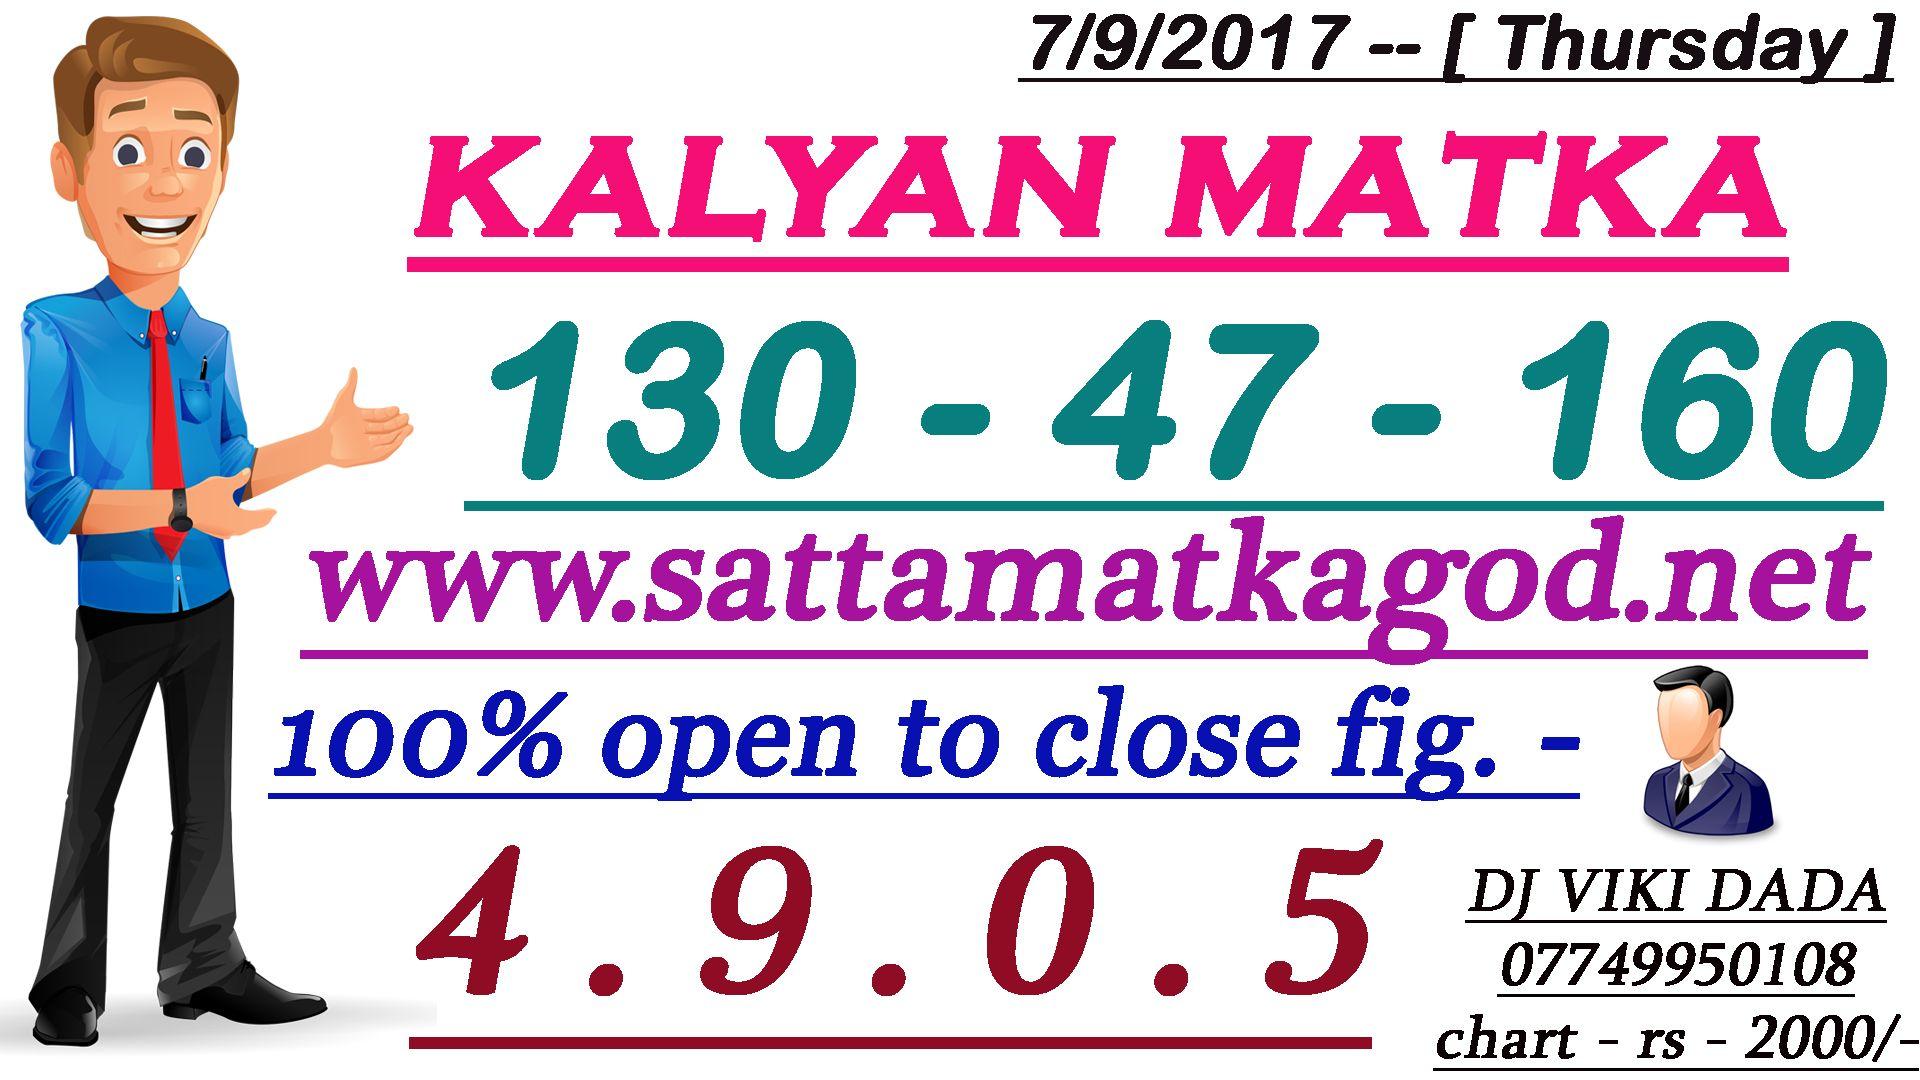 Welcome to the best Satta Matka result, free Satta Matka